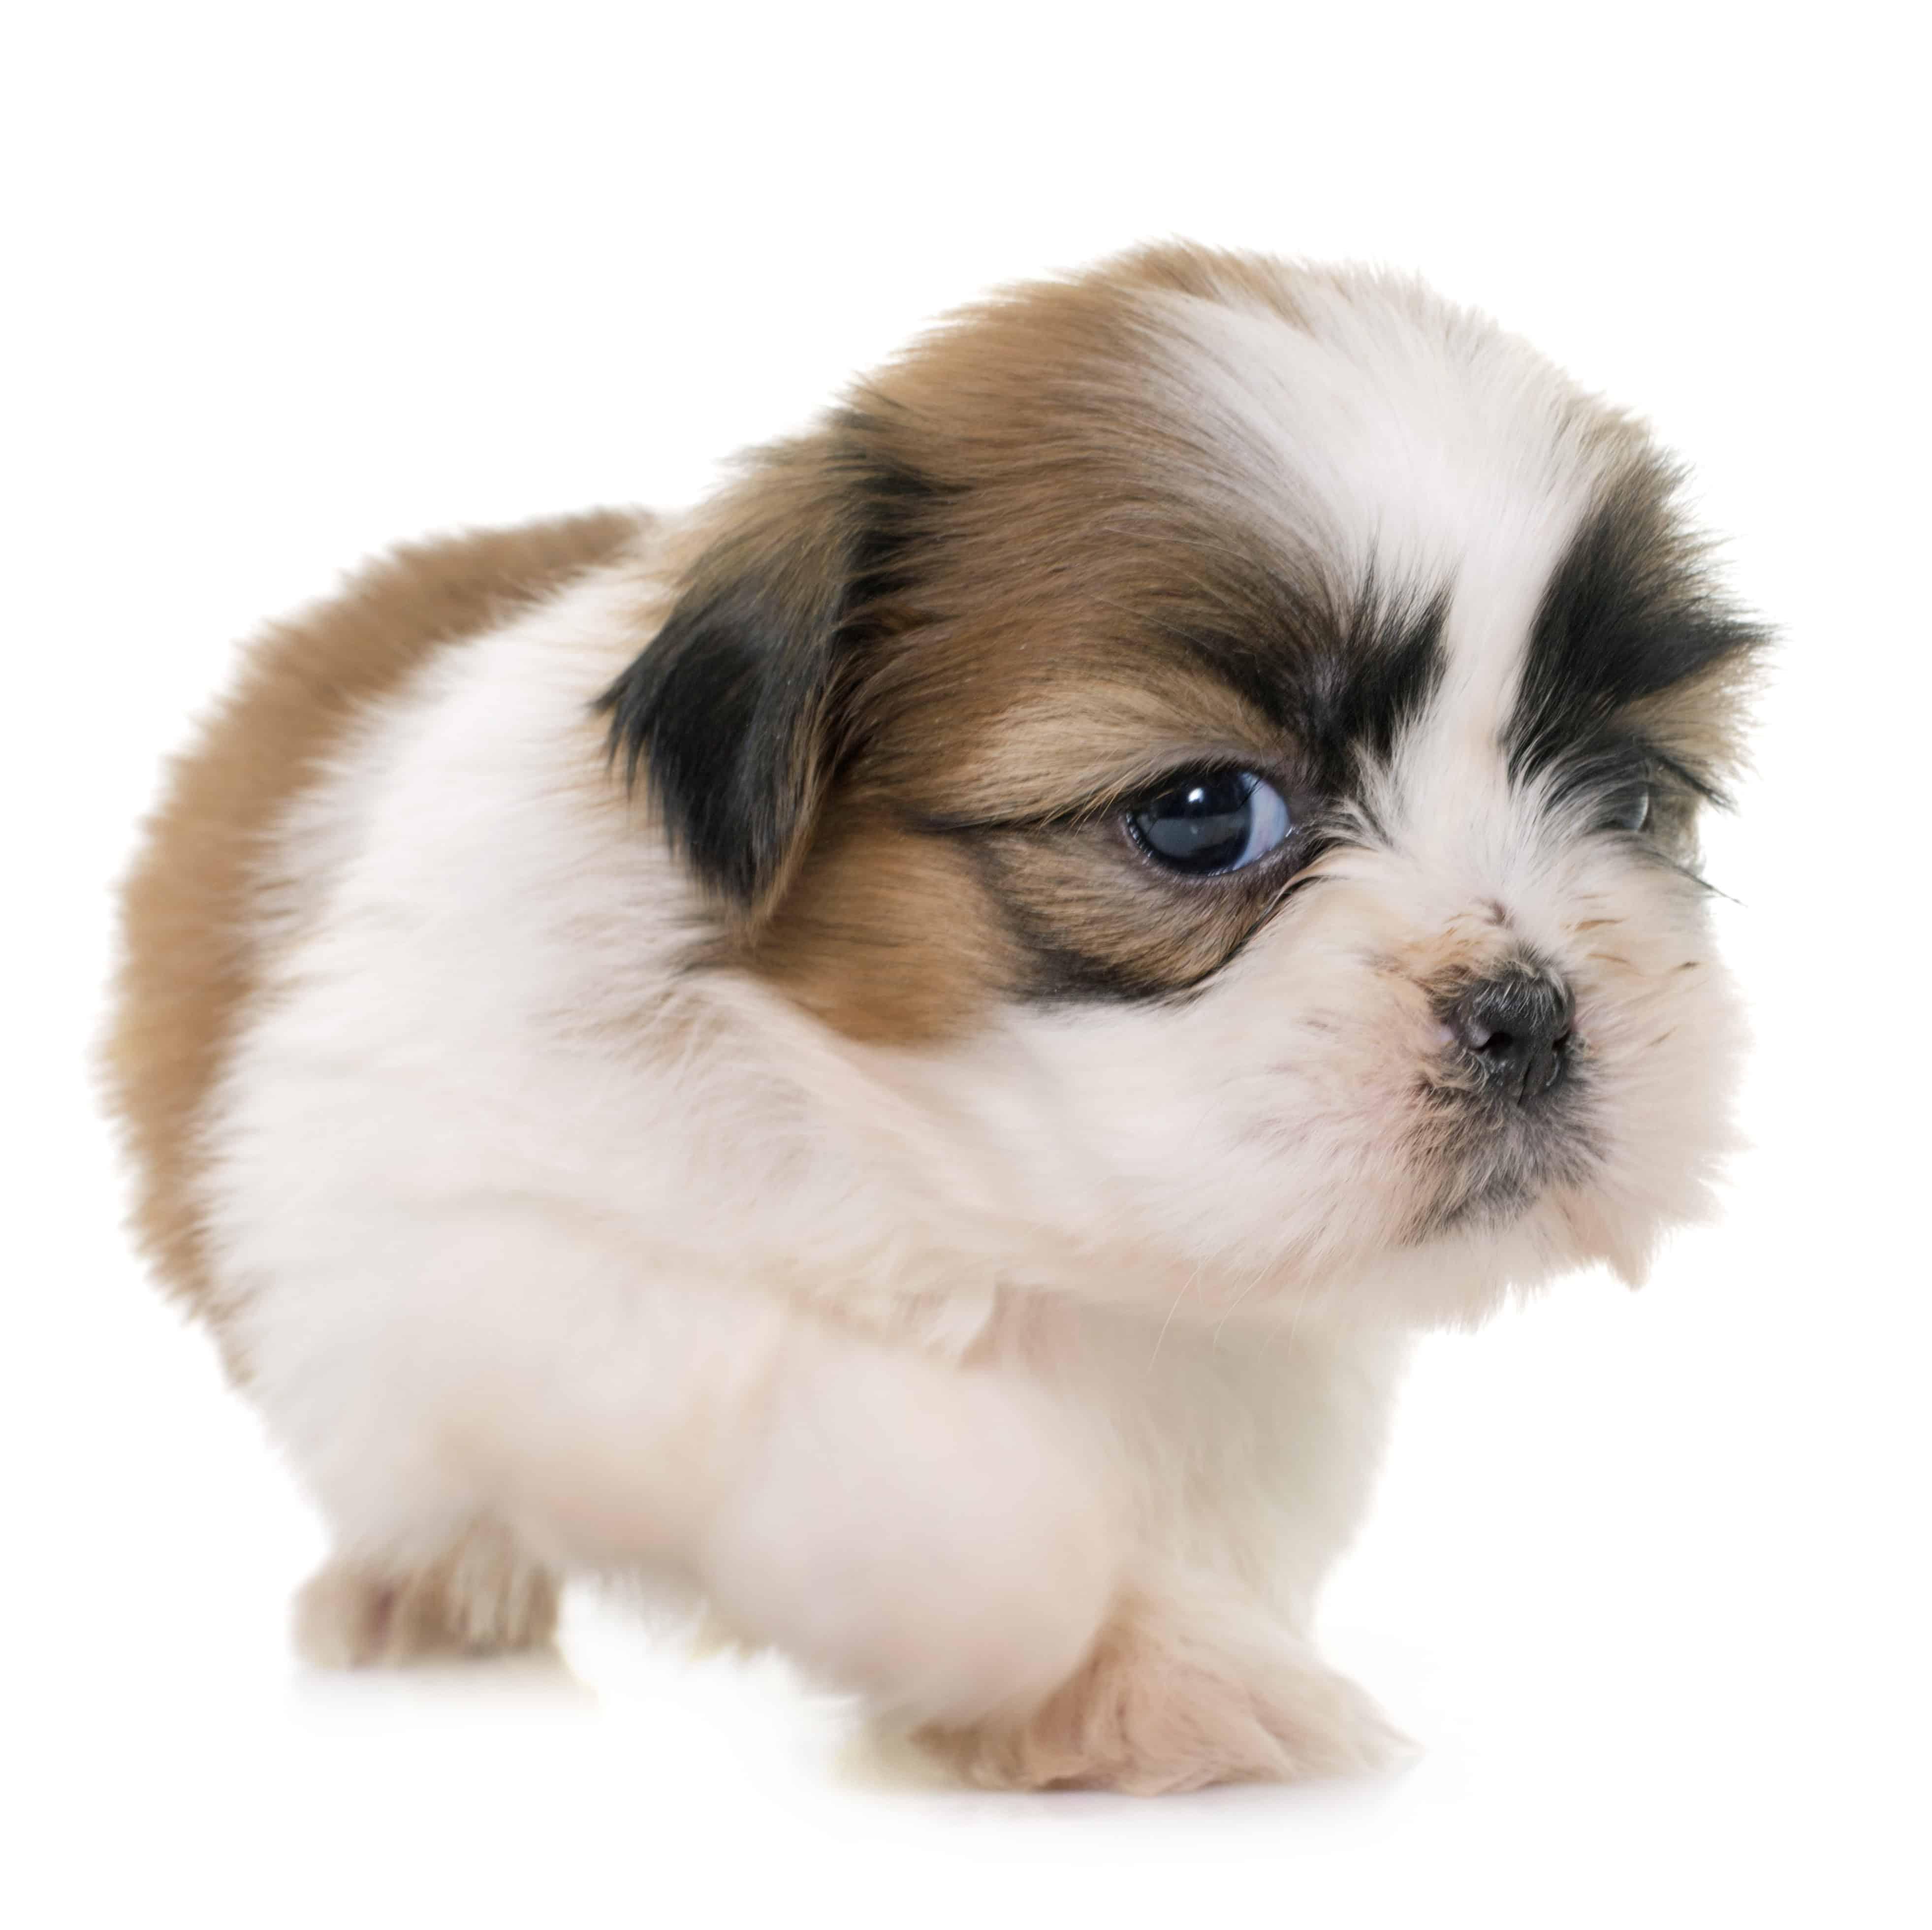 Best Dog Puppy Food For Shih Tzu In